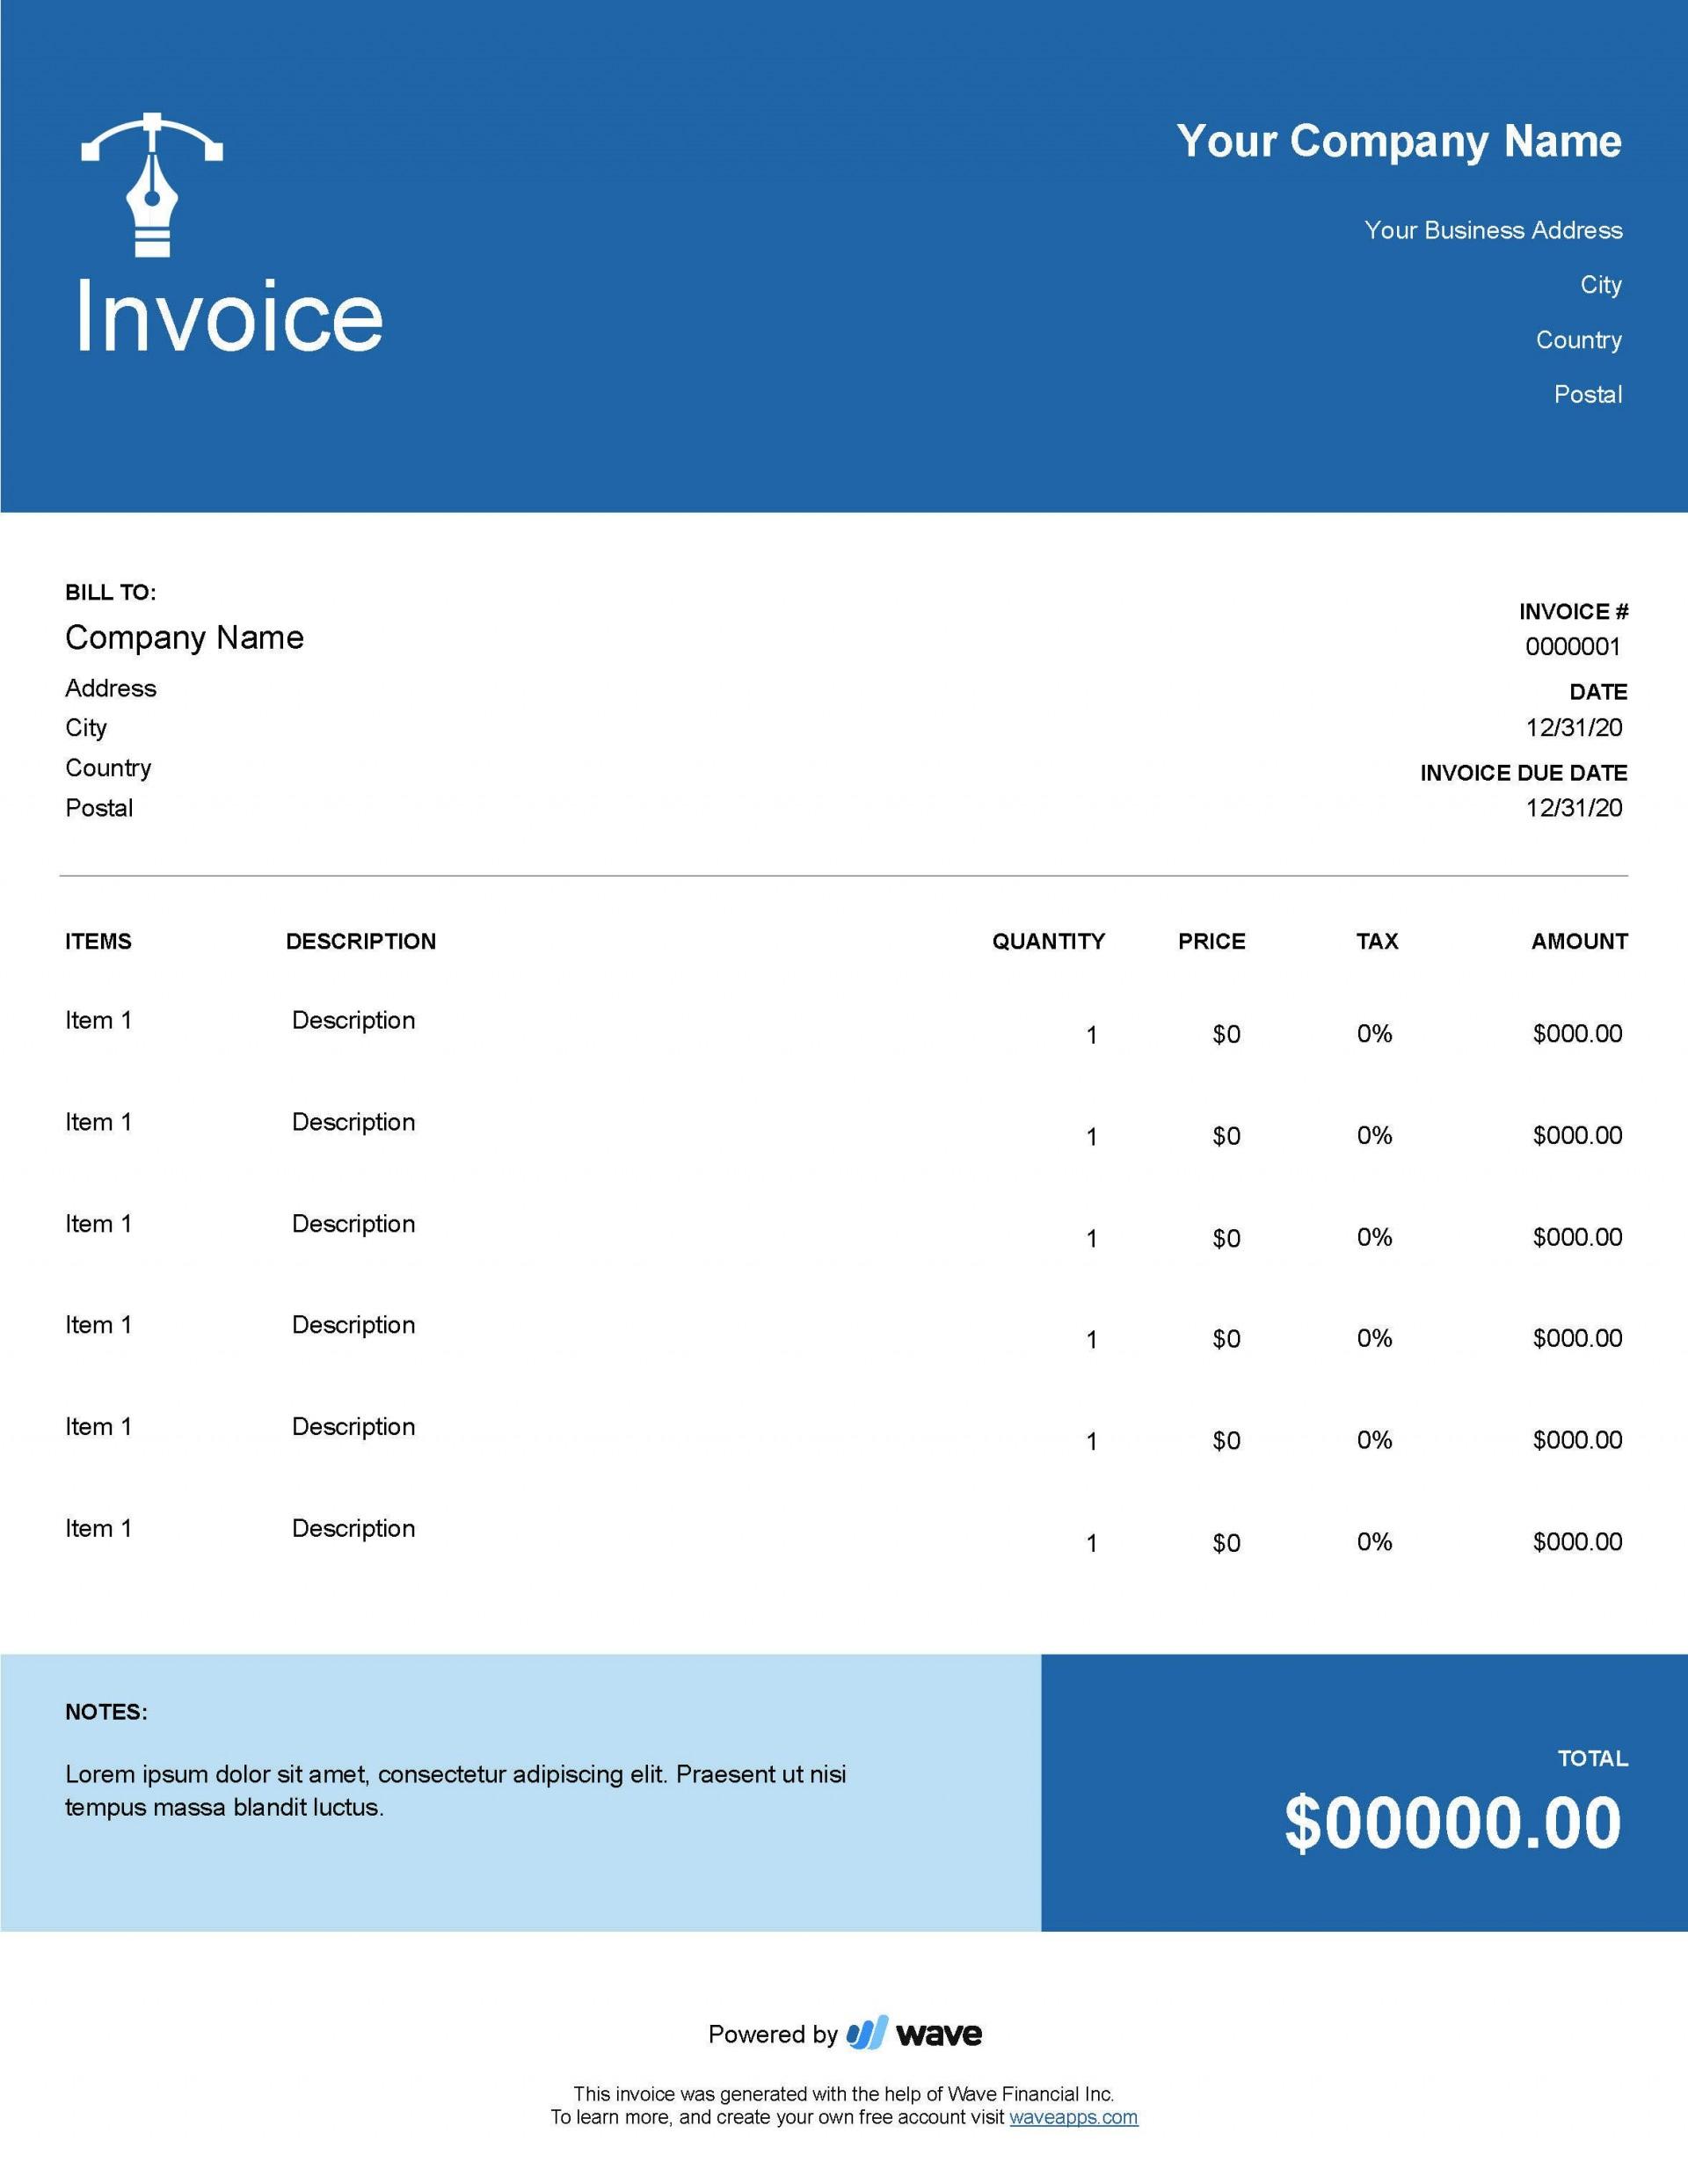 007 Stupendou Freelance Designer Invoice Template Inspiration  Web Creative Uk1920